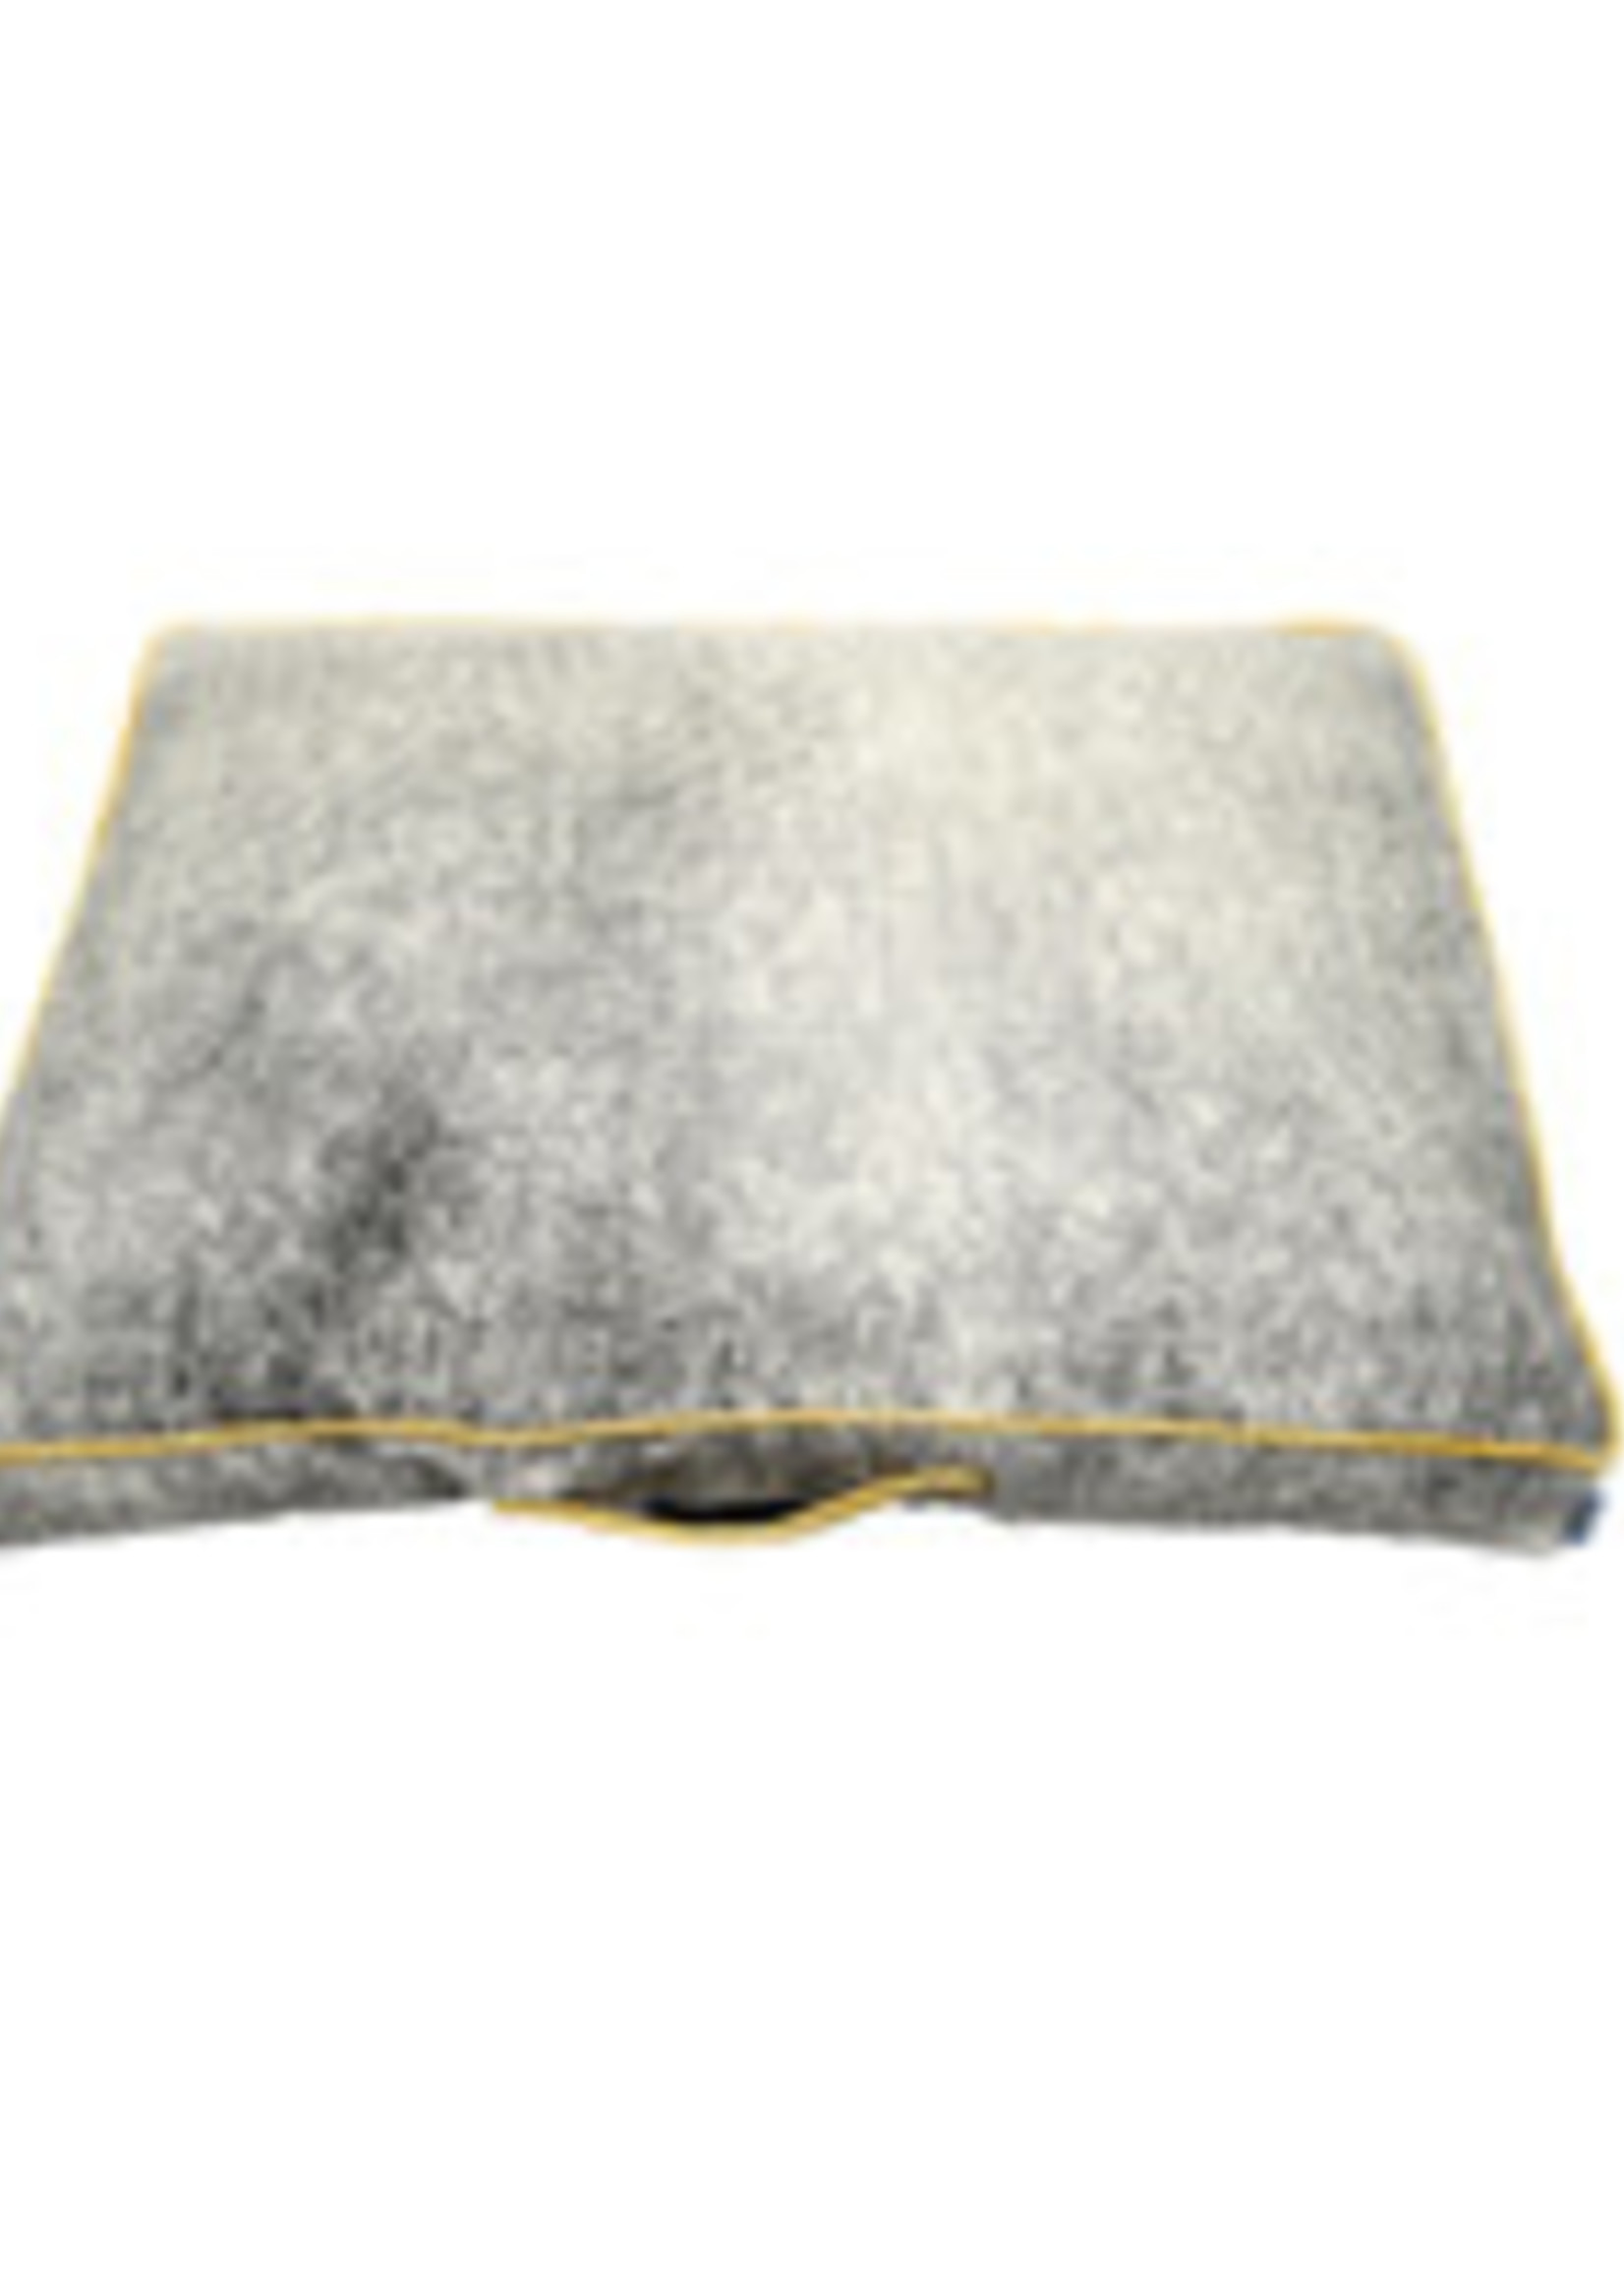 Resploot Resploot Mattress - Rectangular - Grey Smoke - 80 x 60 x 8 cm (32 x 24 x 3 in)